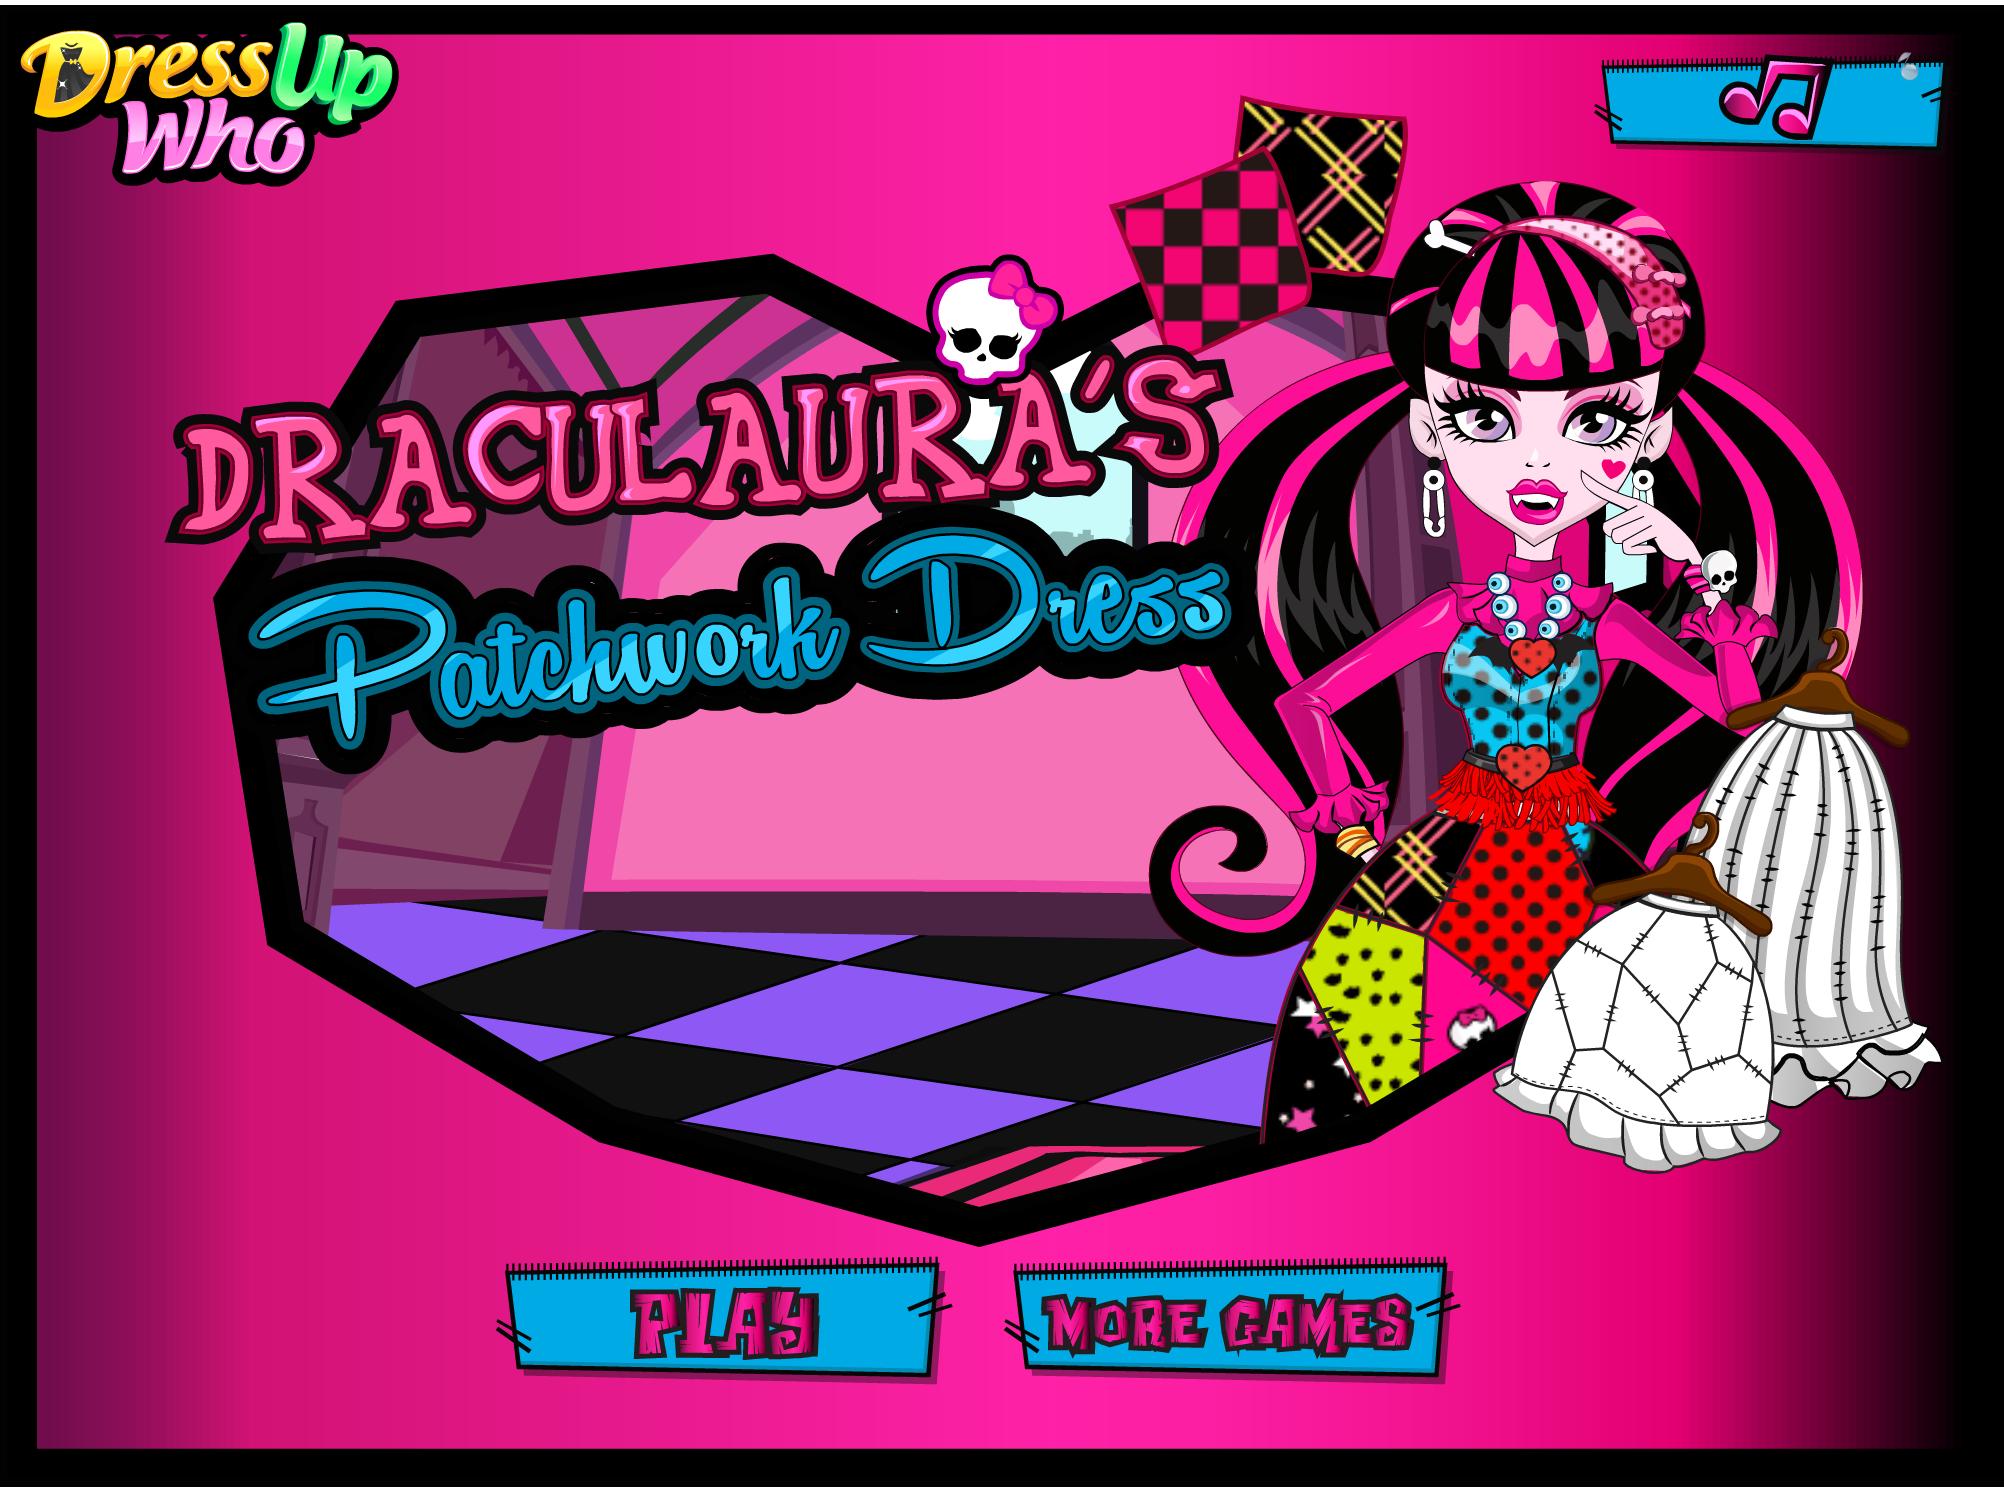 Draculaura S Patchwork Dress Dress Up Who Patchwork Dress Fashion Designer Game Monster High Dolls